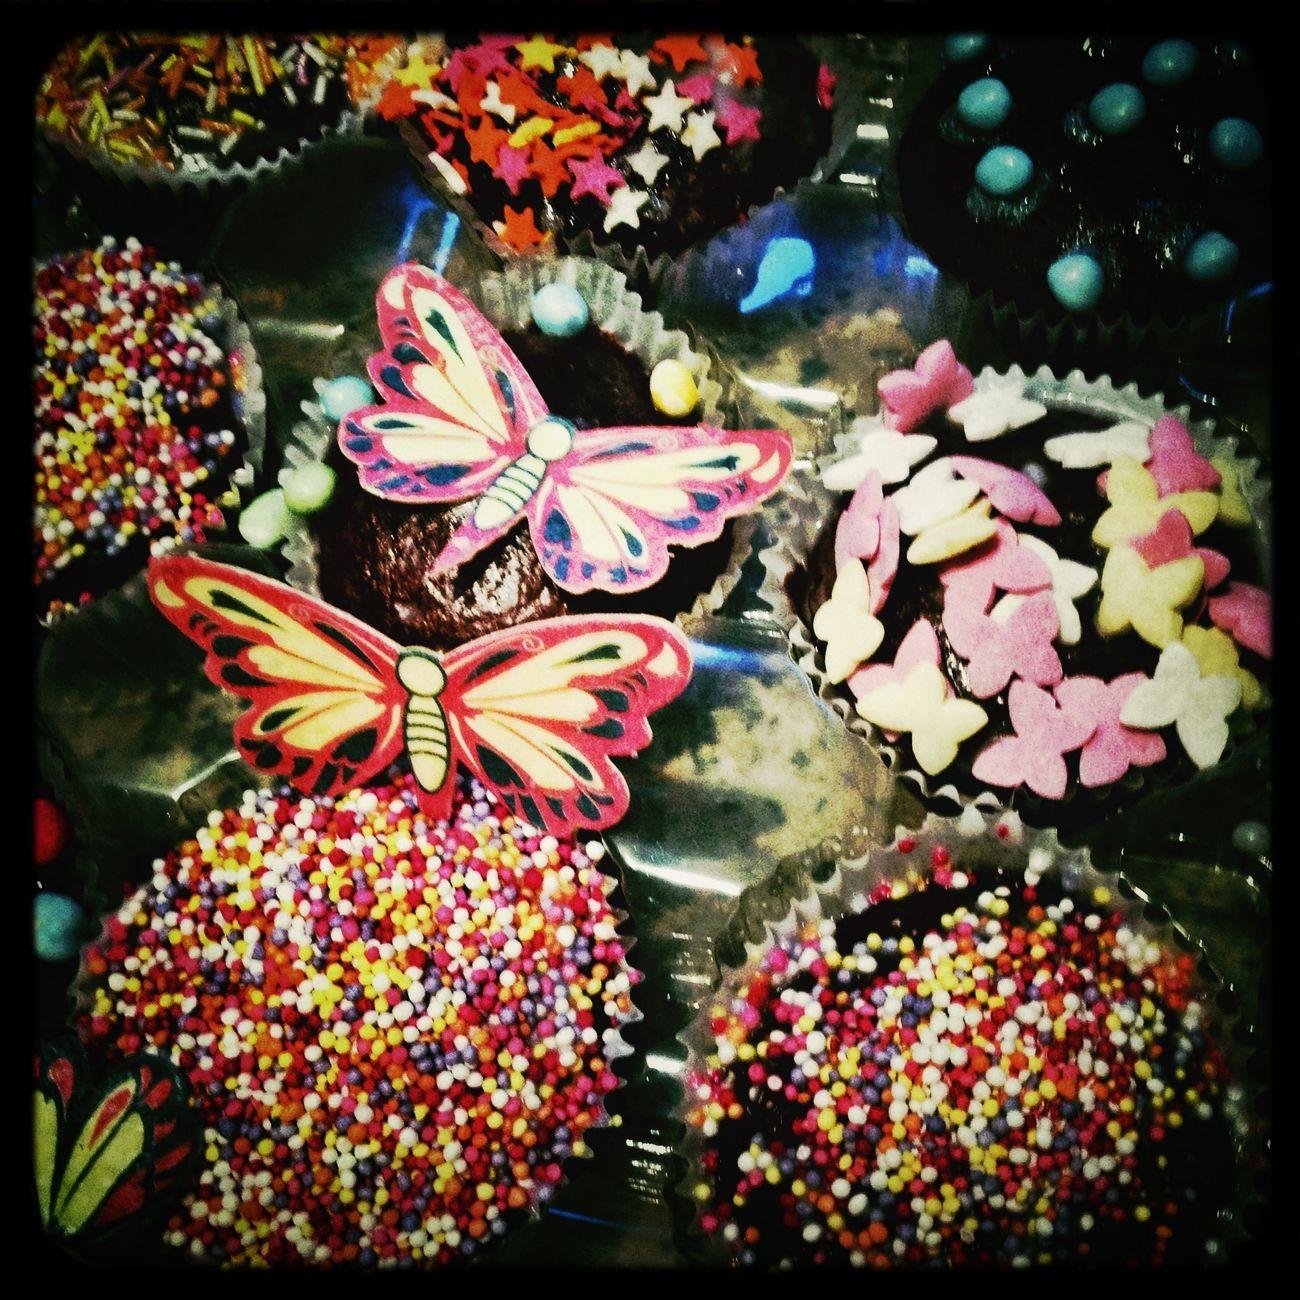 Mulhollands Fairycakes